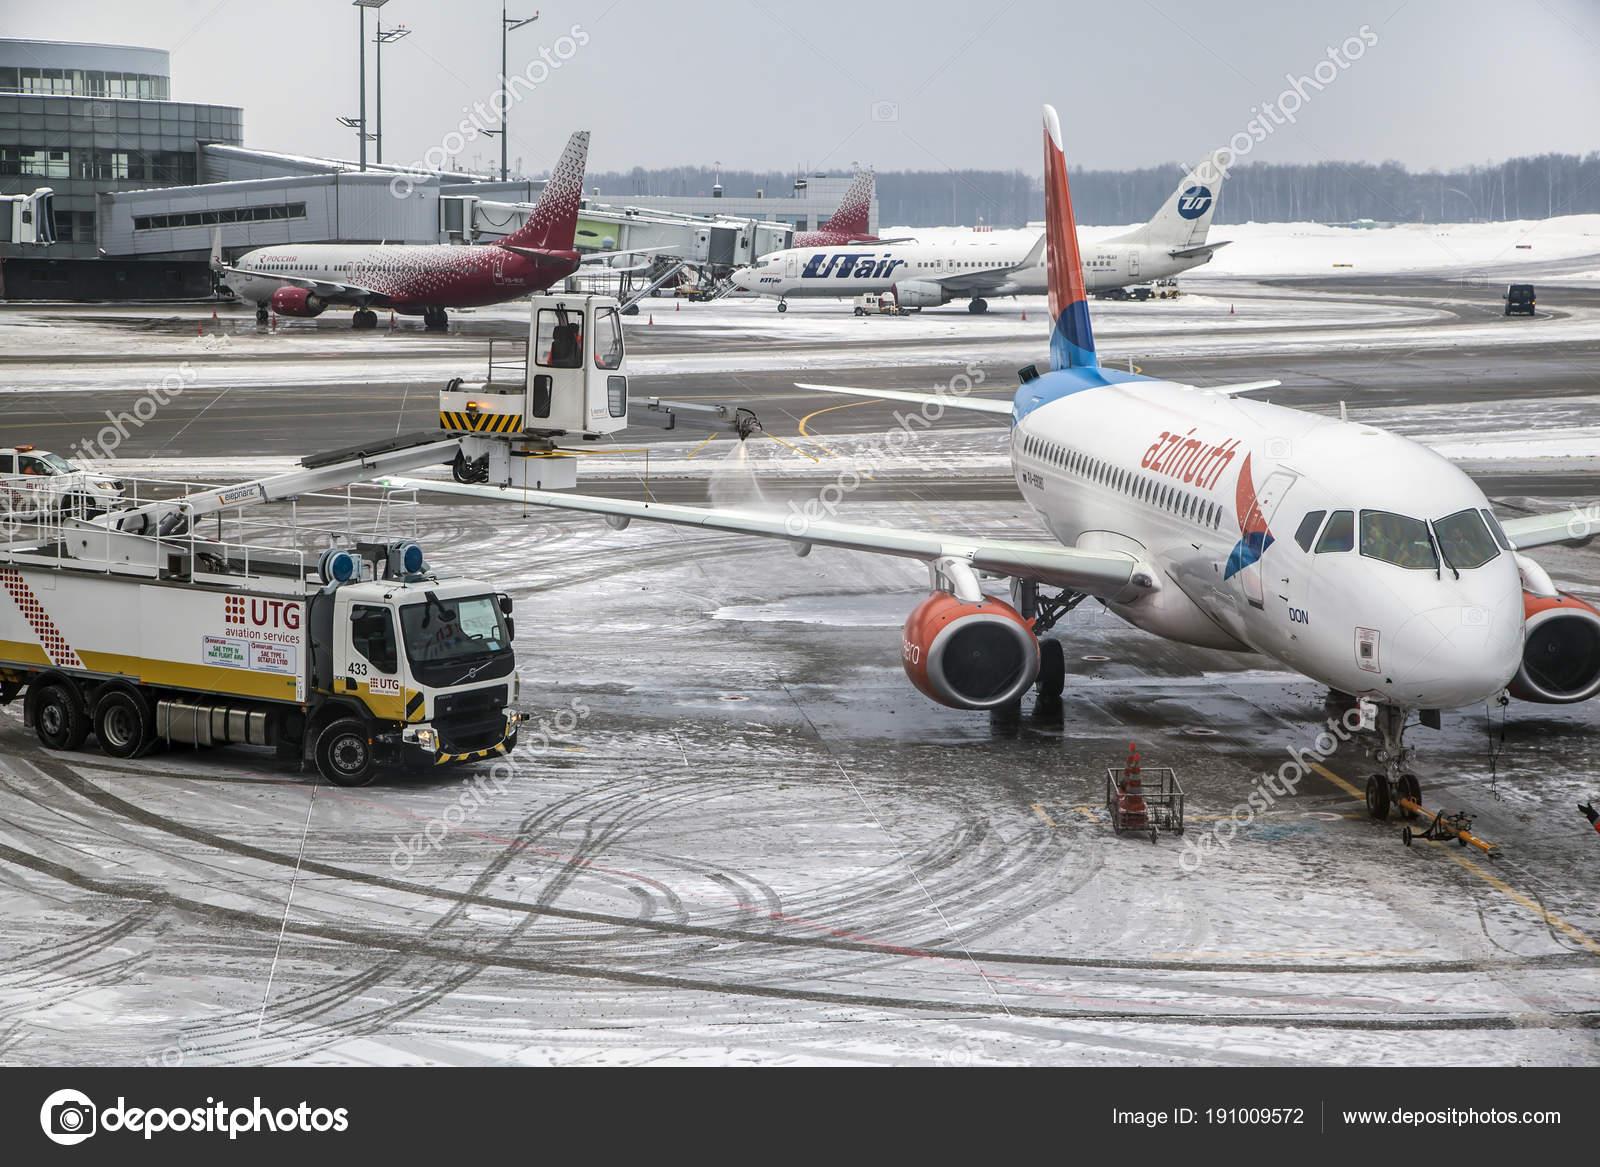 Обои ночь, Boeing 737, Самолёт, b737, tuifly, aircraft. Авиация foto 18